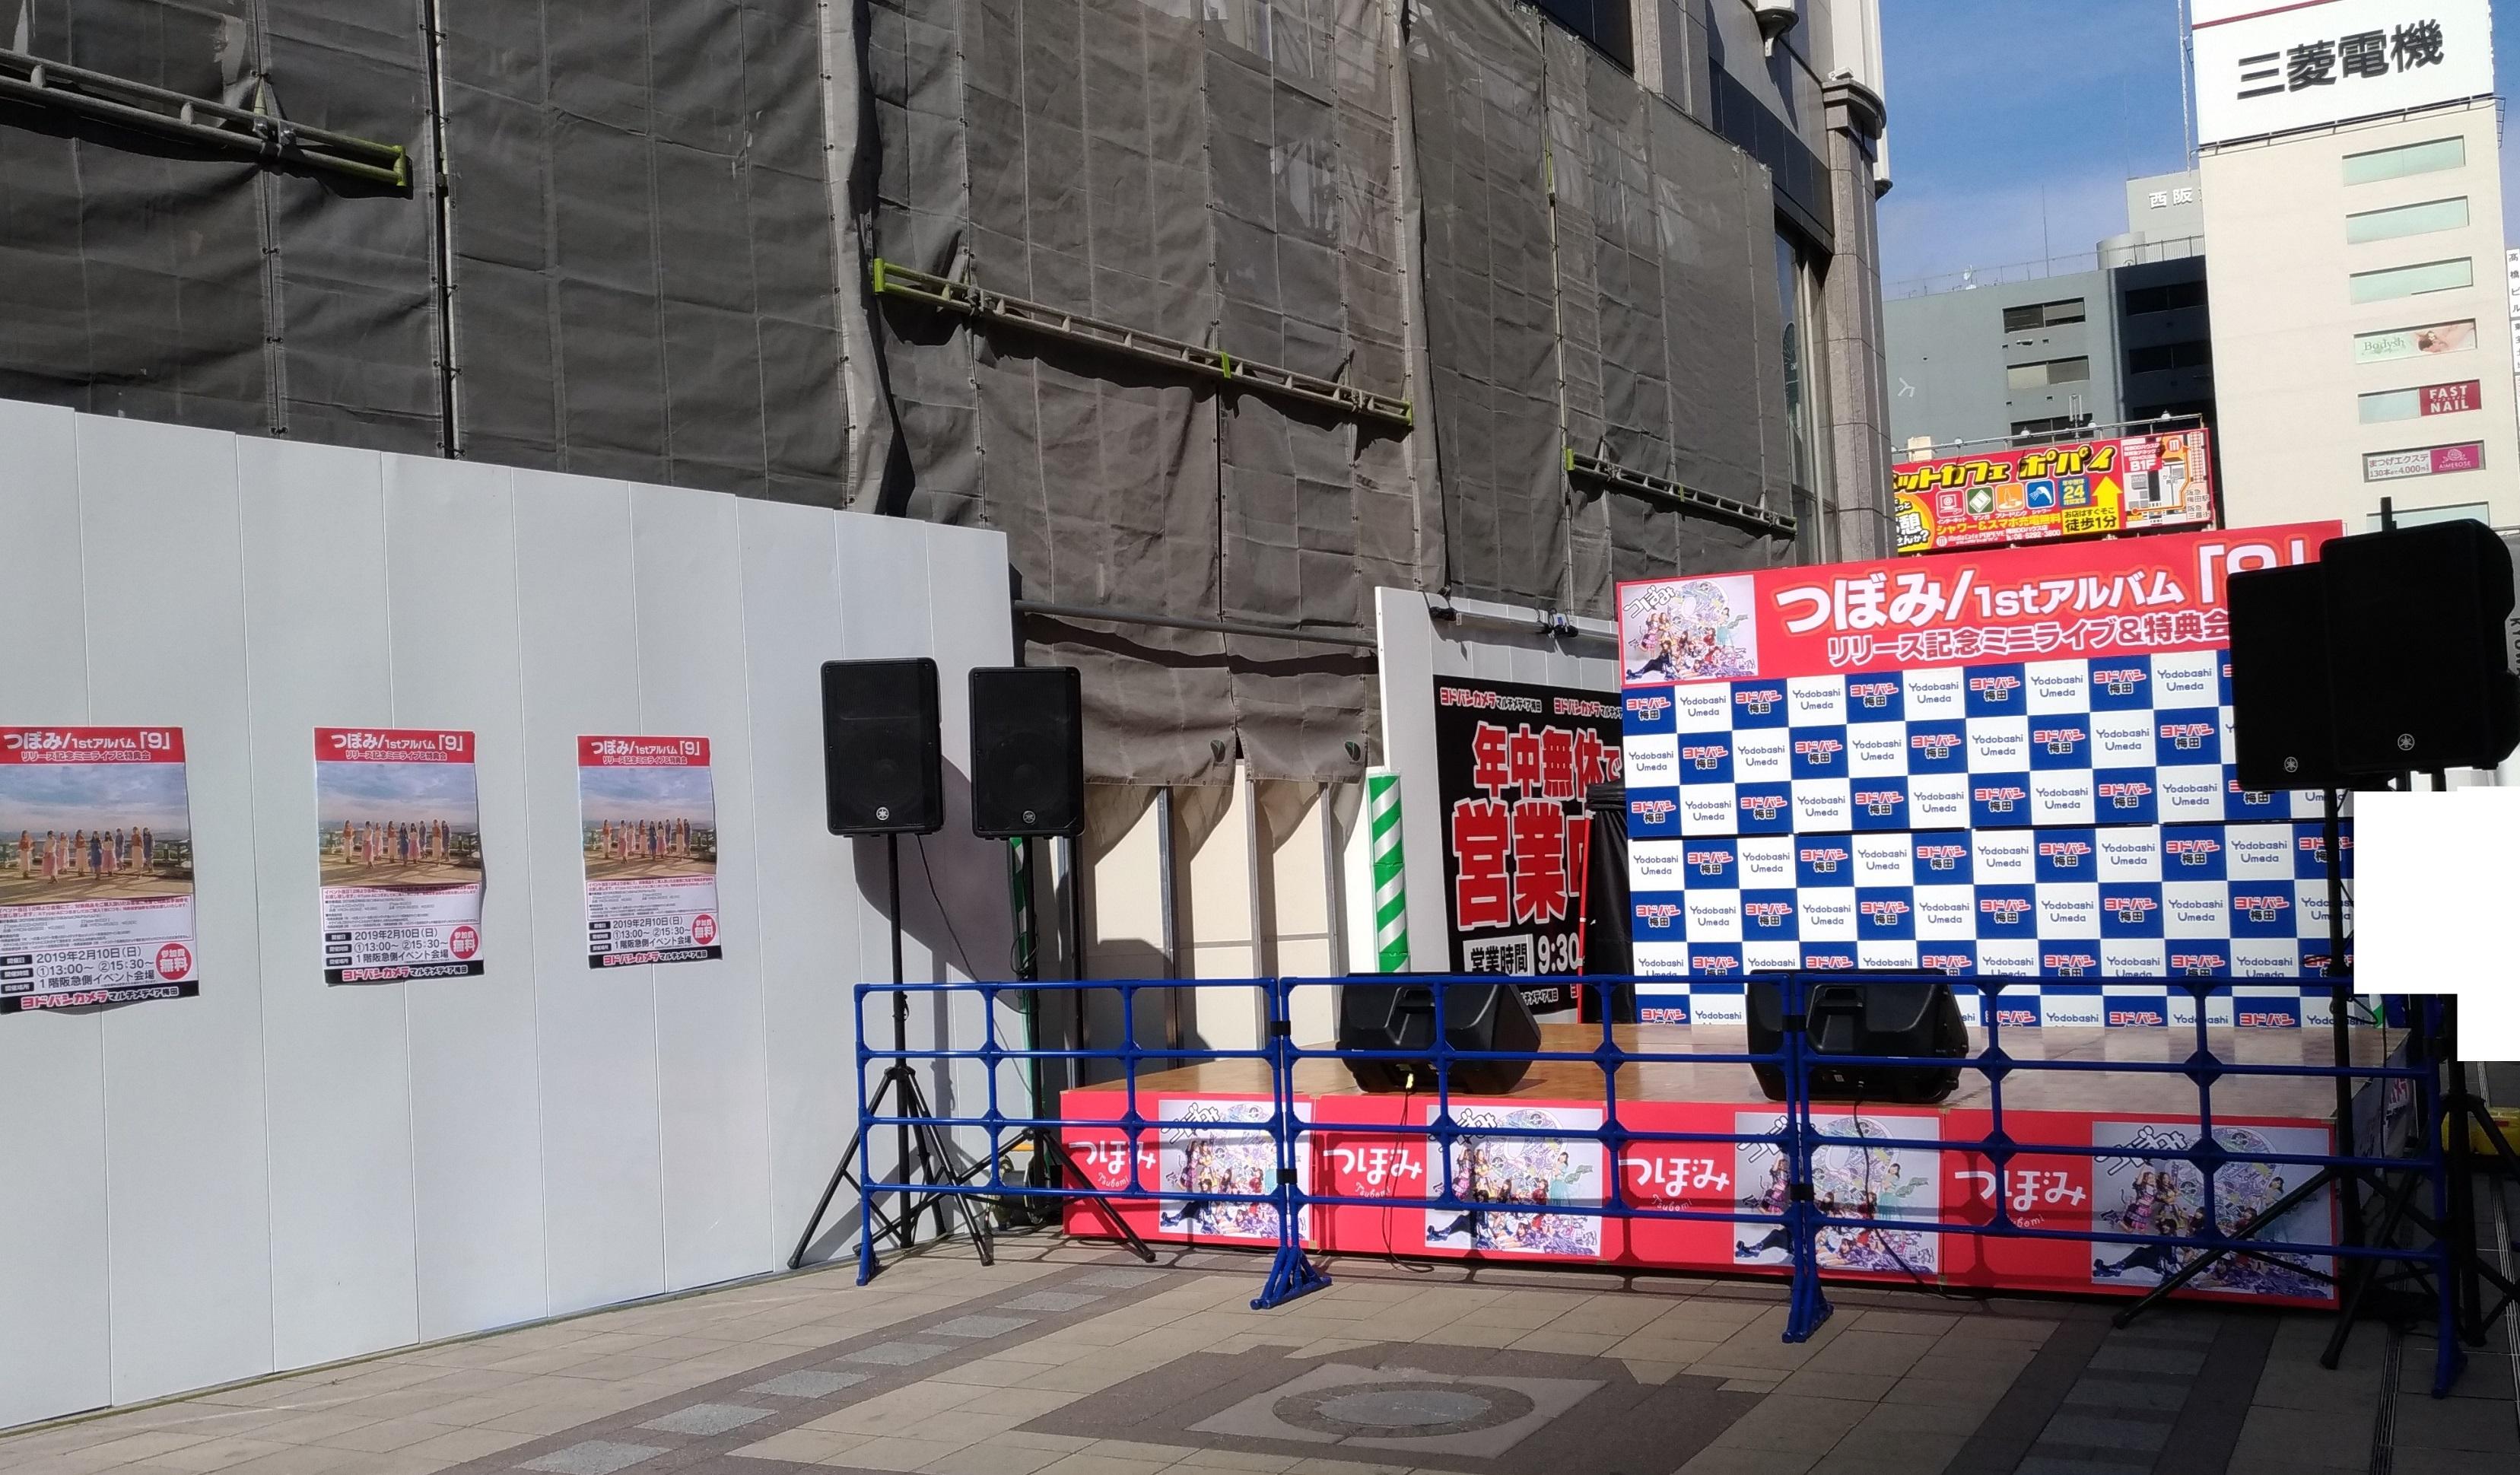 osaka_events_tsubomi_yodobashi1.jpg